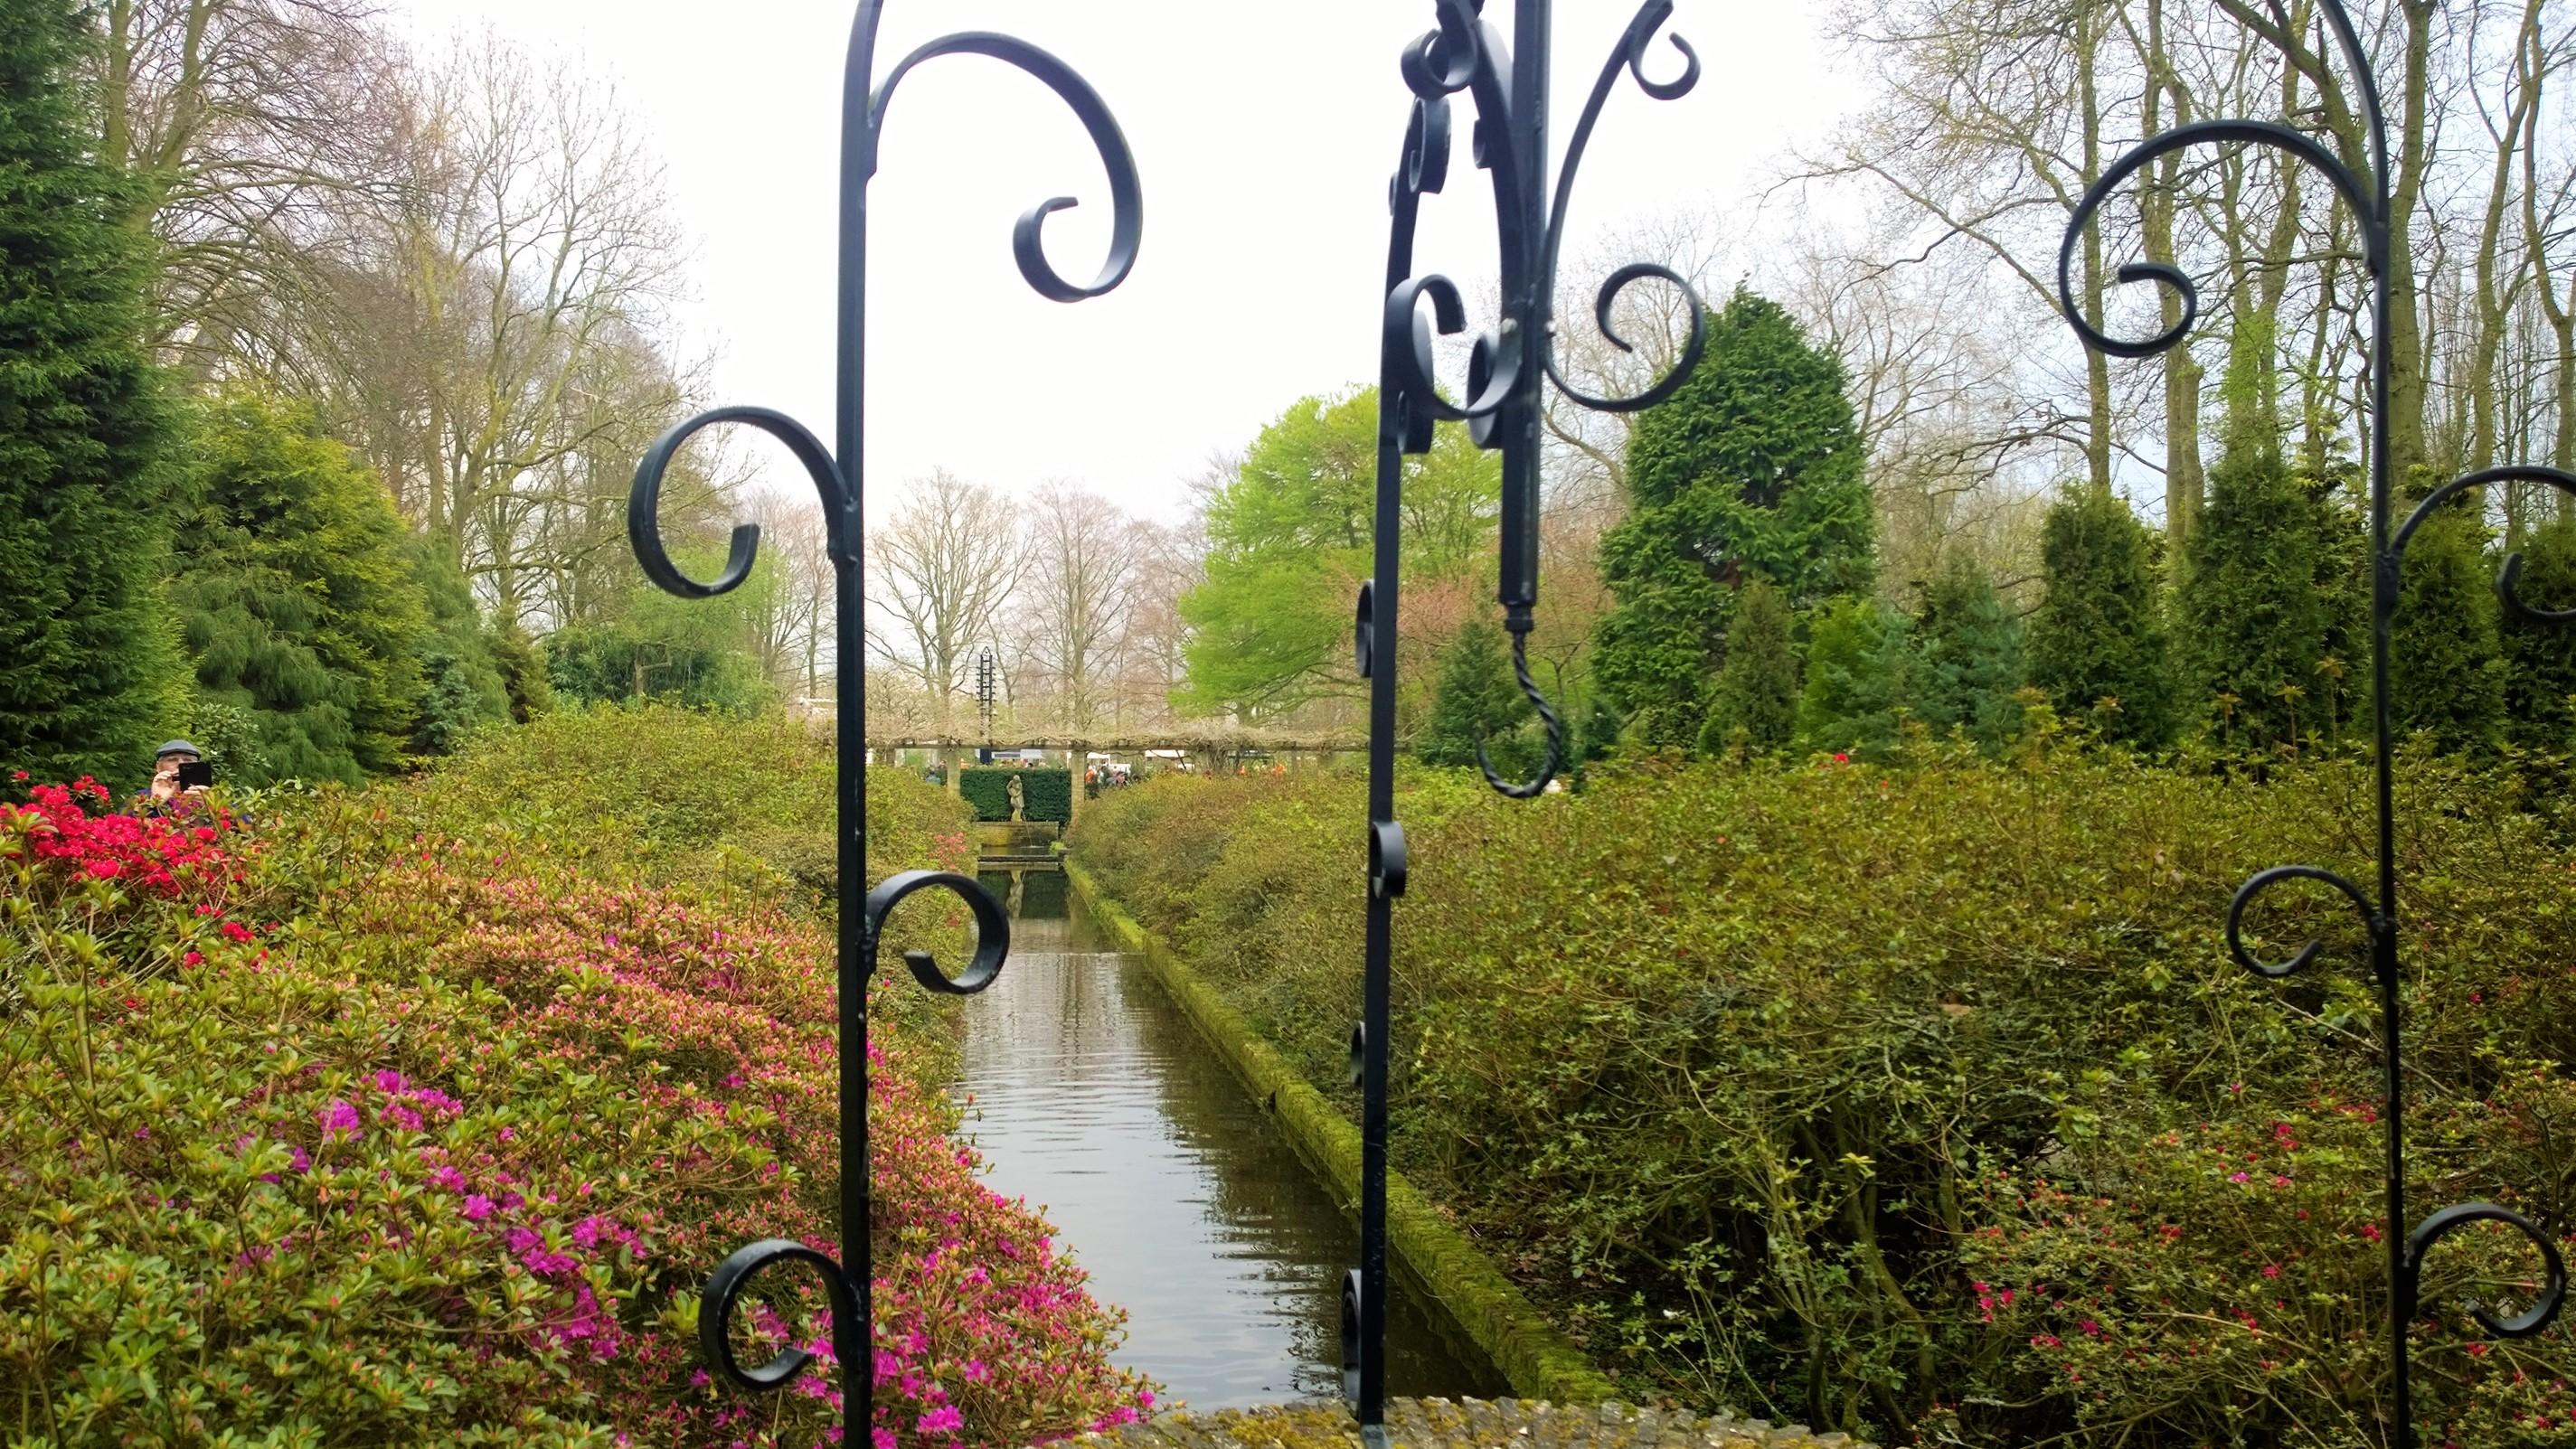 Foto de Vanessa Tuleski, em Keukenhof, na Holanda.